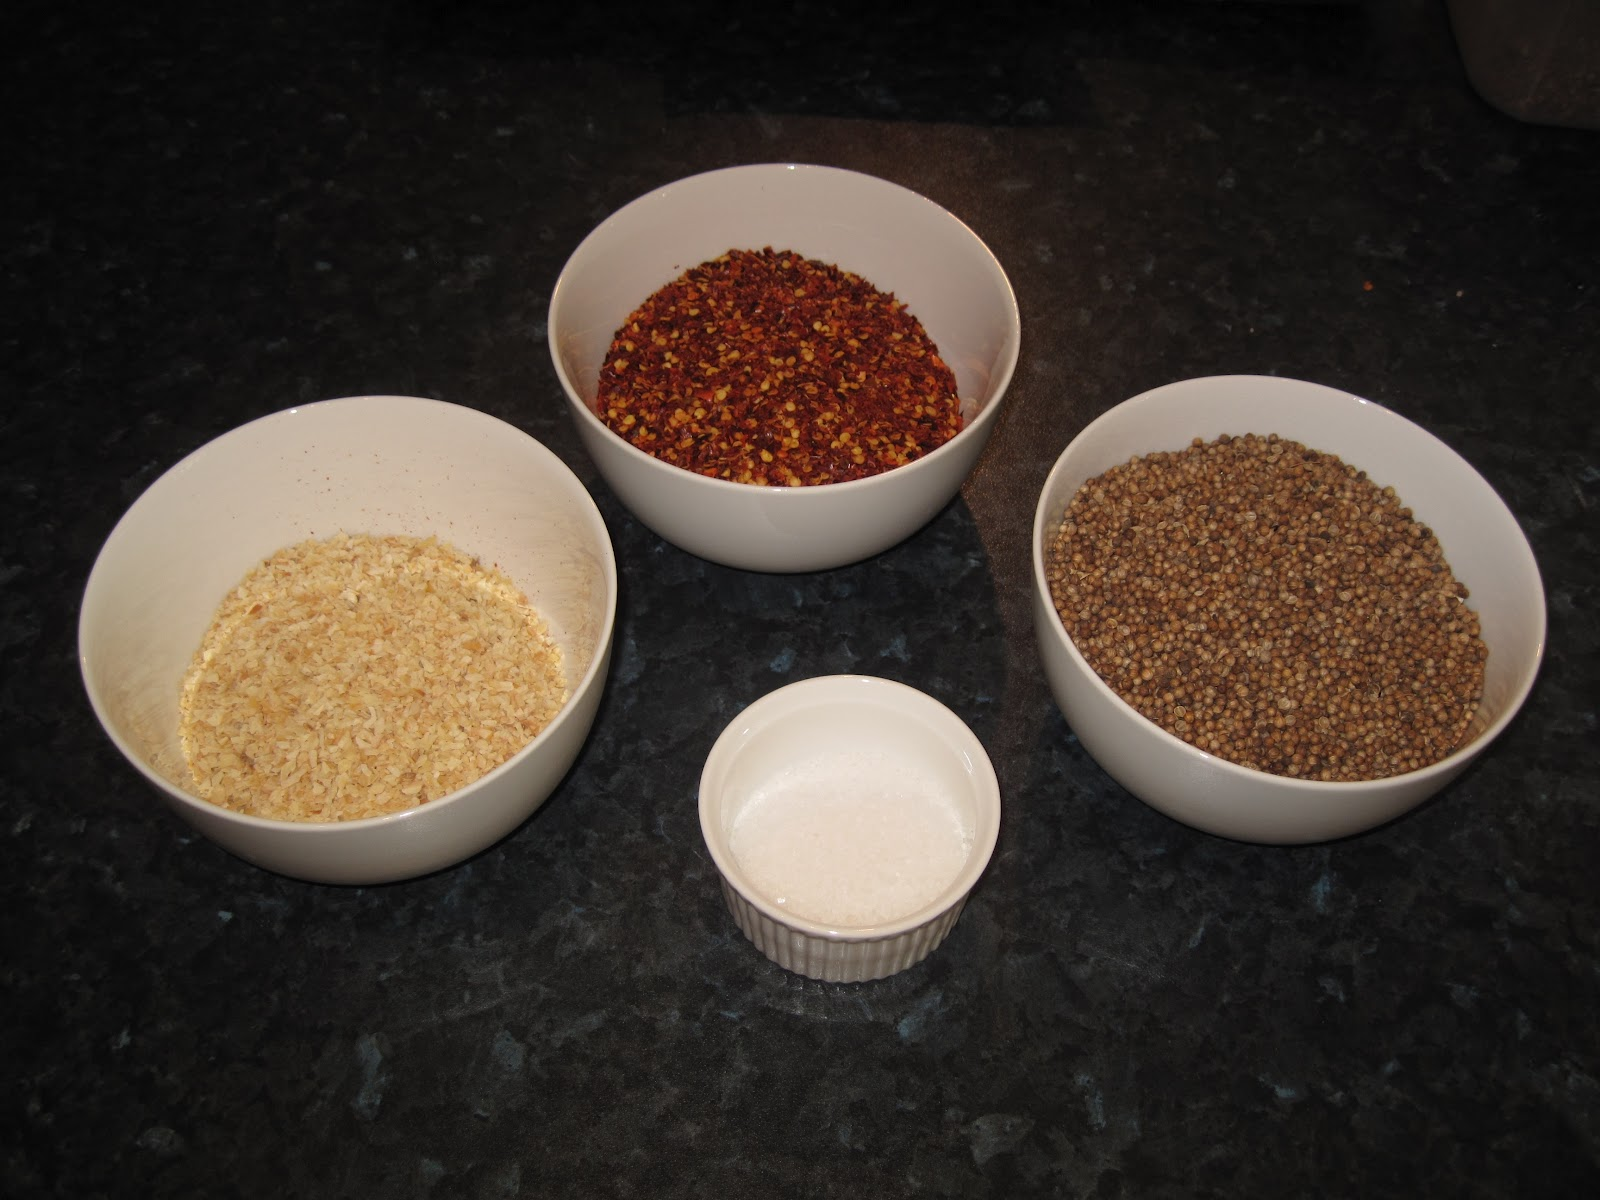 Biltong Spice - Mixing Biltong Spice